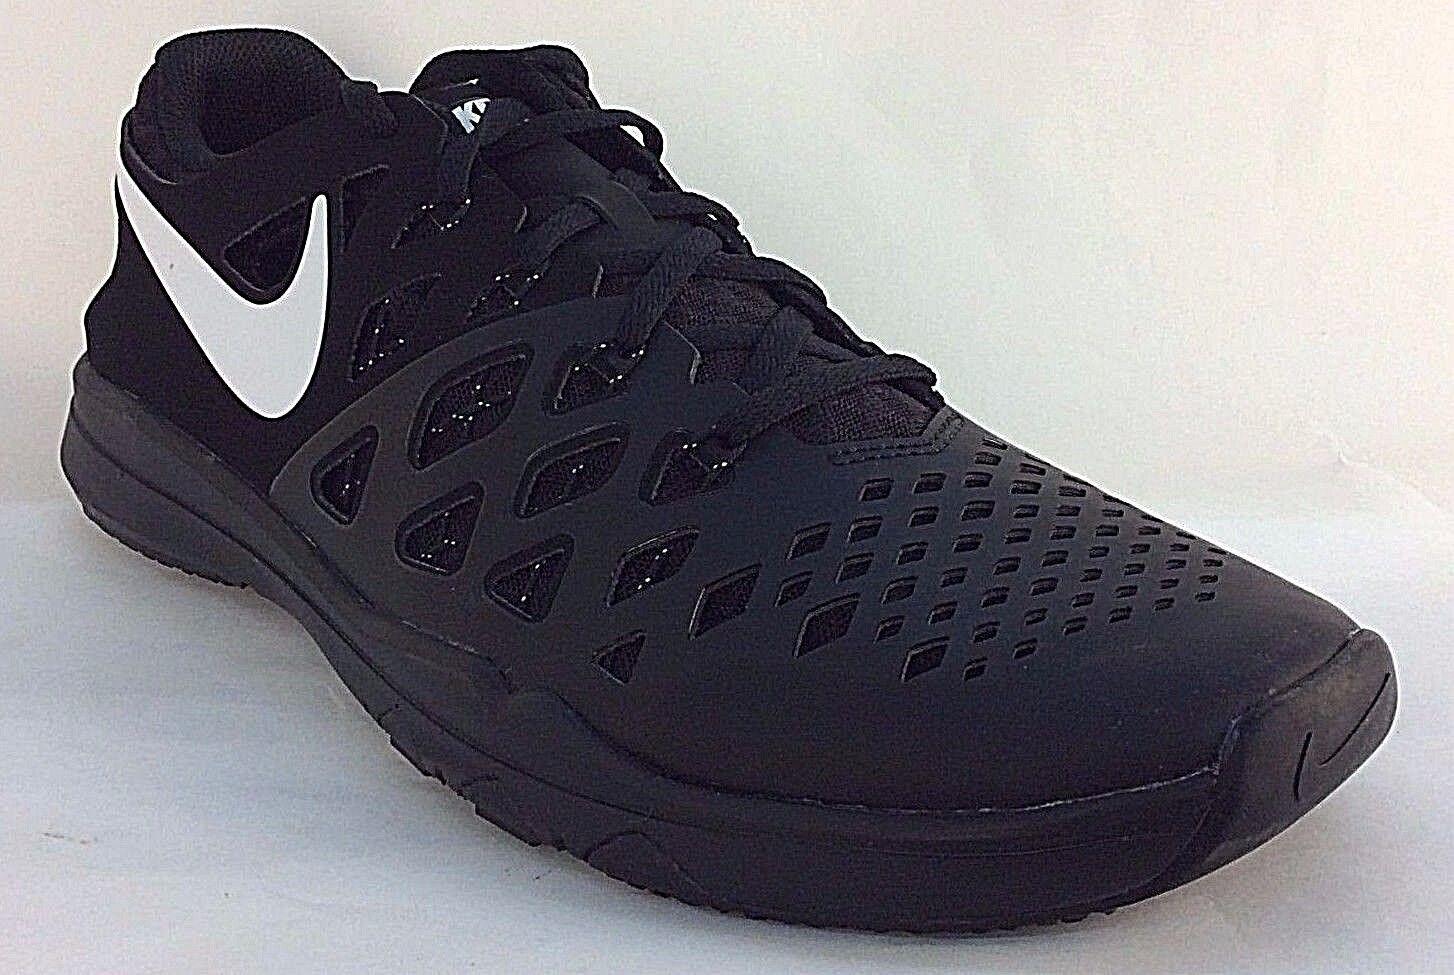 newest b61df ec815 Men s Nike Train Speed Speed Speed 4 TB Training Shoes, 833259 010 Sizes  8.5-